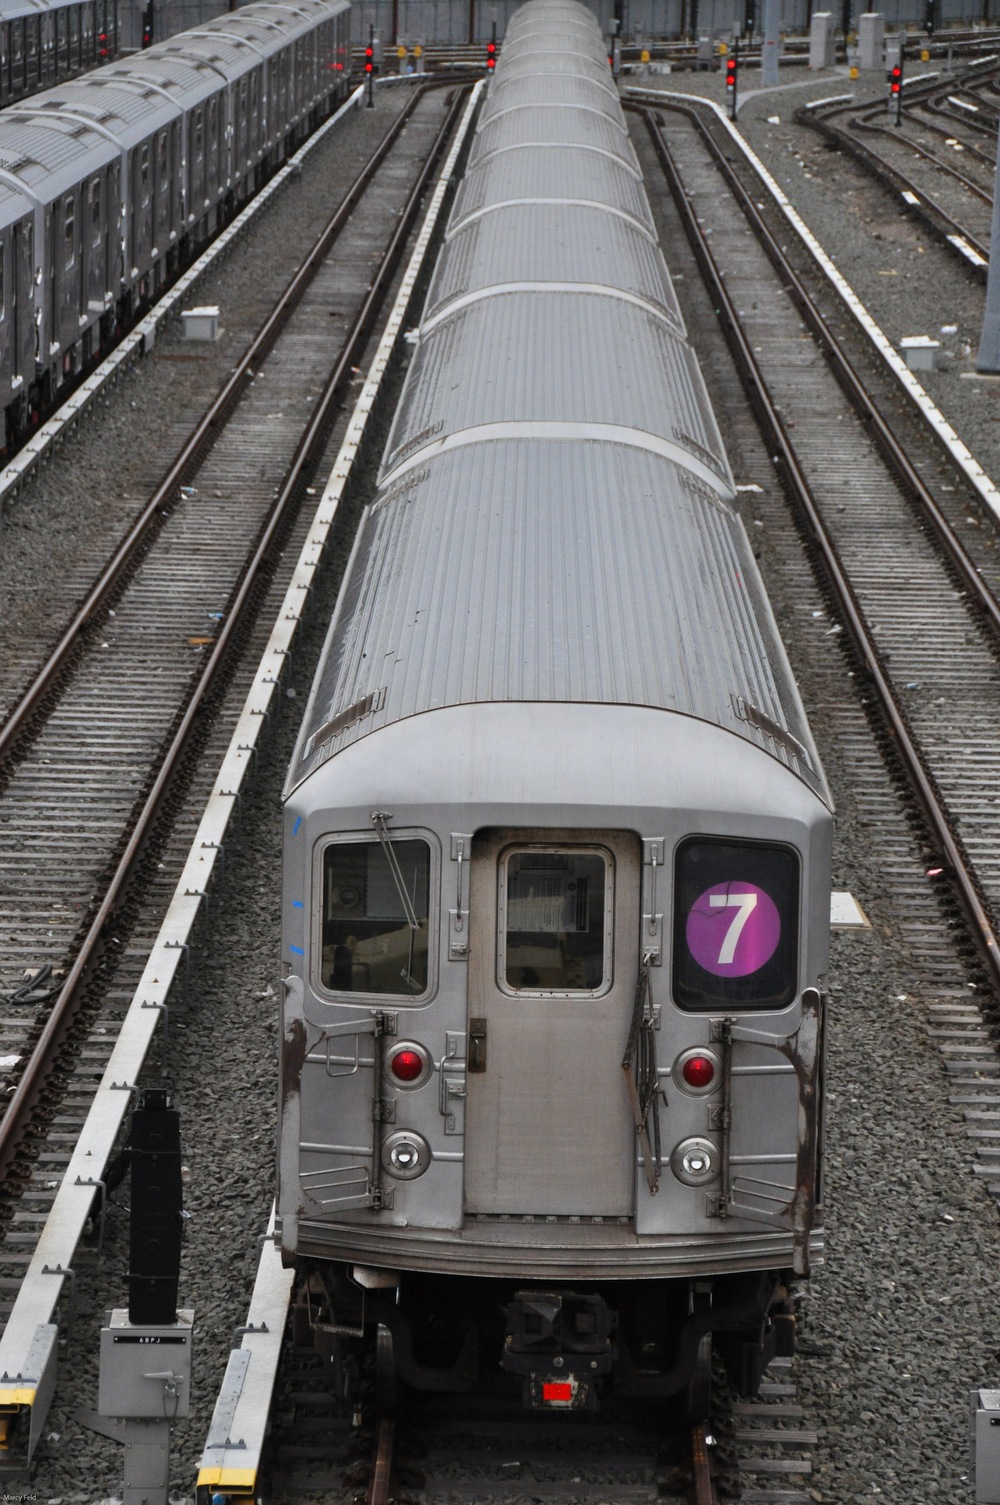 ©2014marcyfeldphotography 7 train